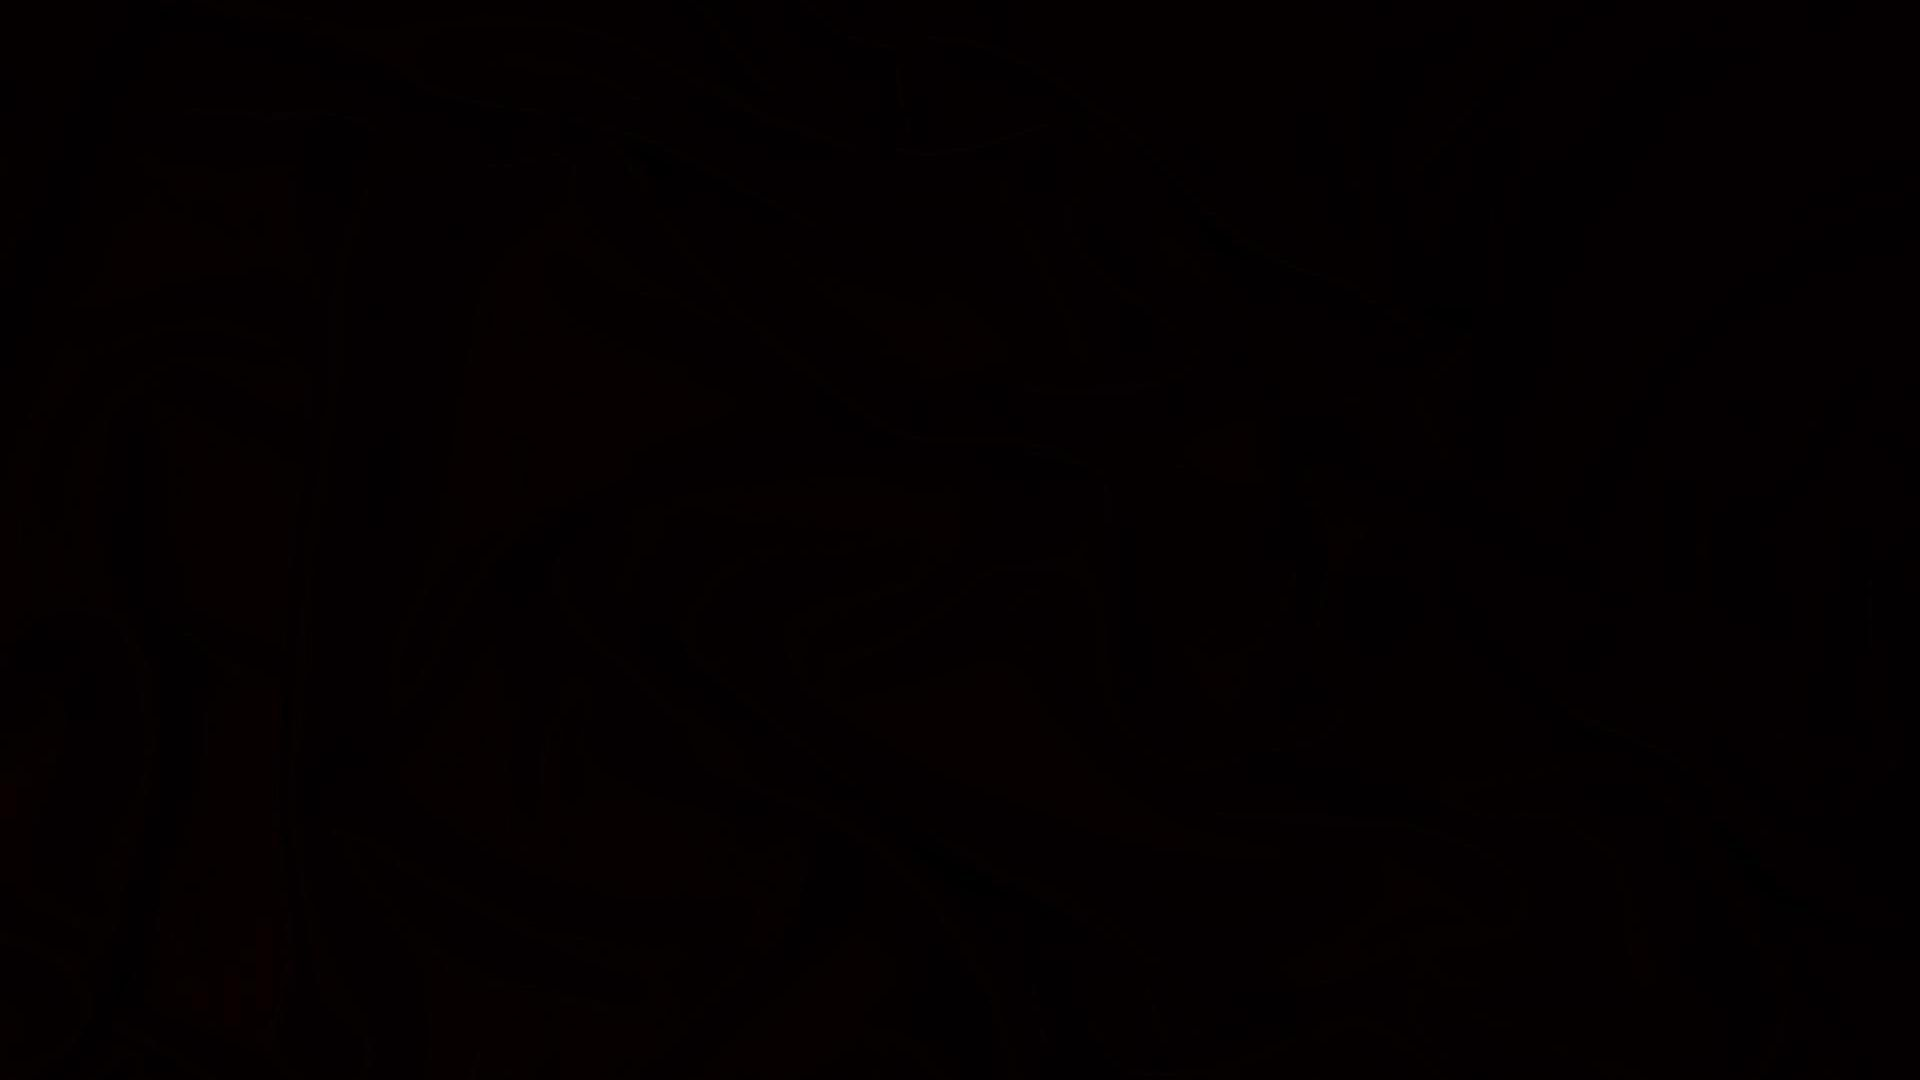 s black cool windows desktop dark hd wallpaper for your pc mac or